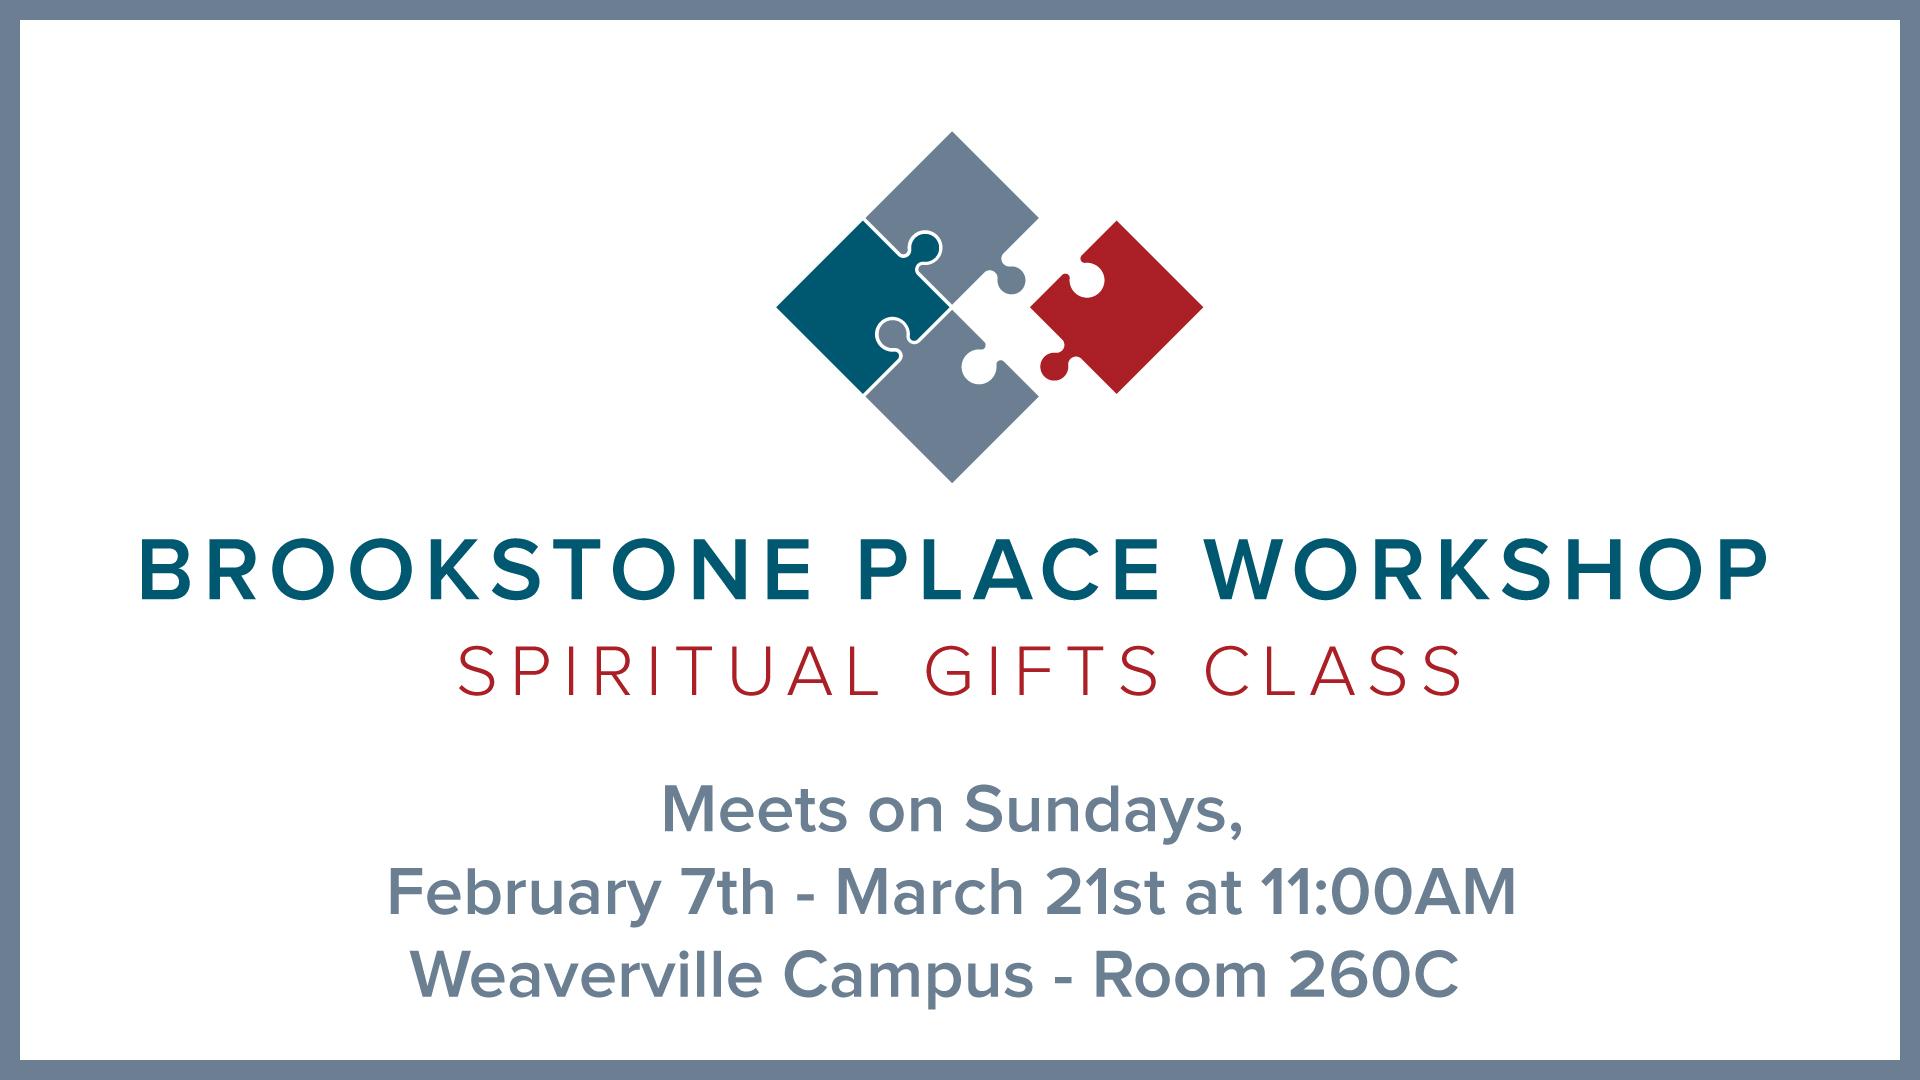 Brookstone-Place-Workshop-web-HD-Feb-202.jpg